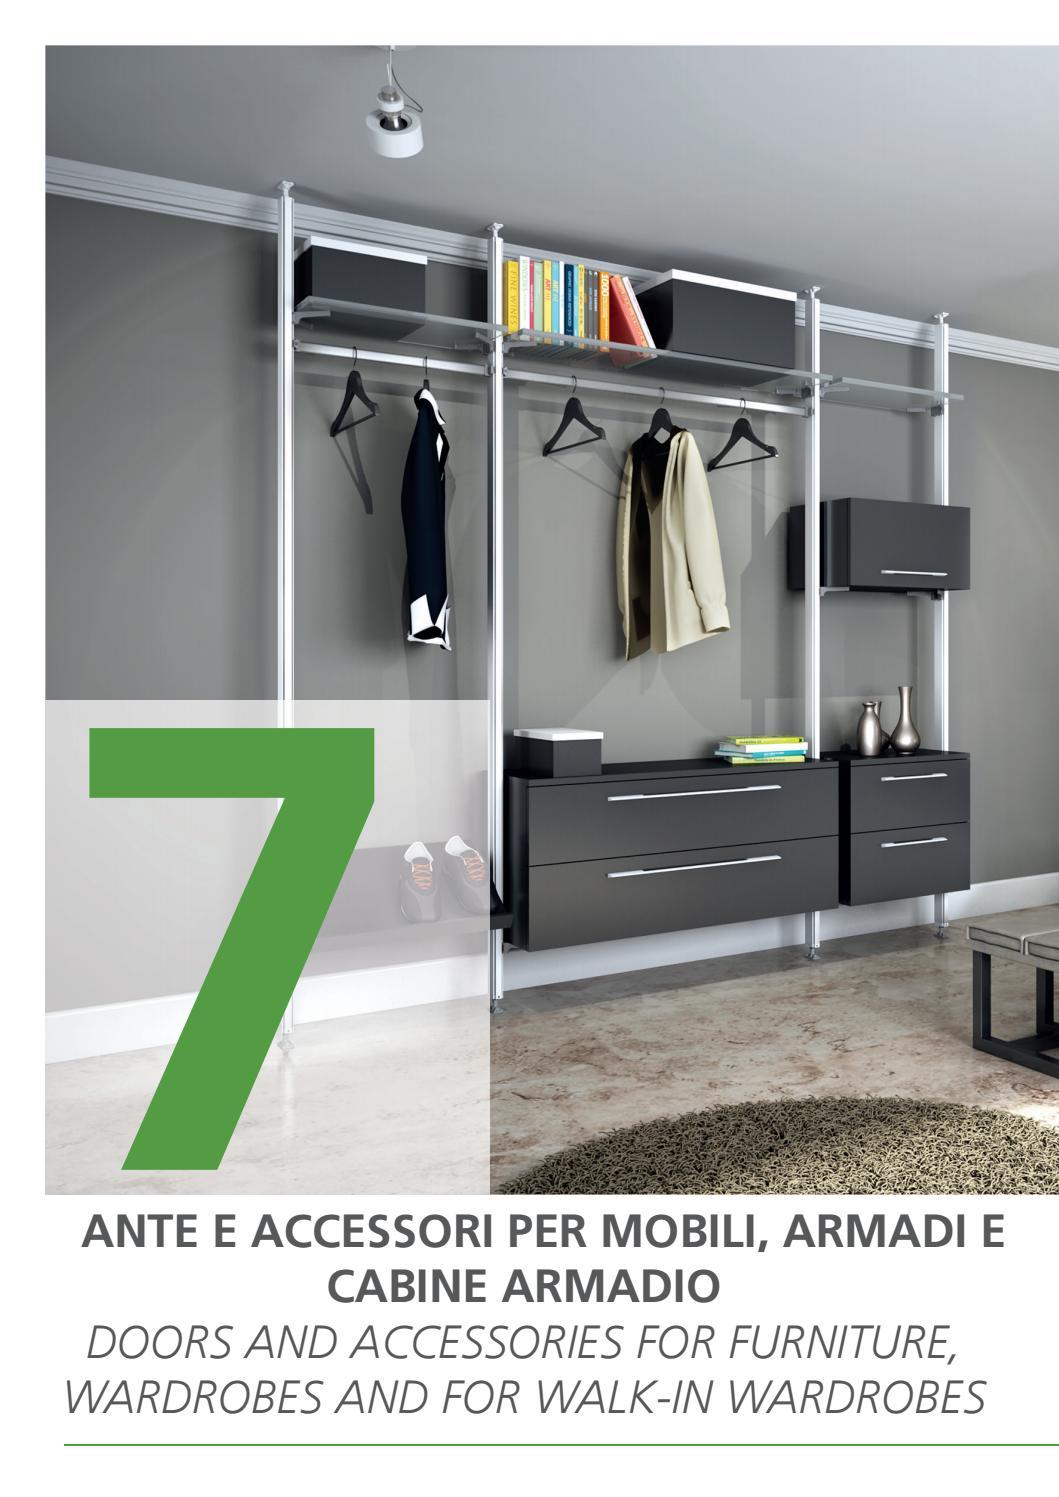 PORTE, ACCESSORI PER MOBILI, ARMADI / DOORS, ACCESSORIES ...